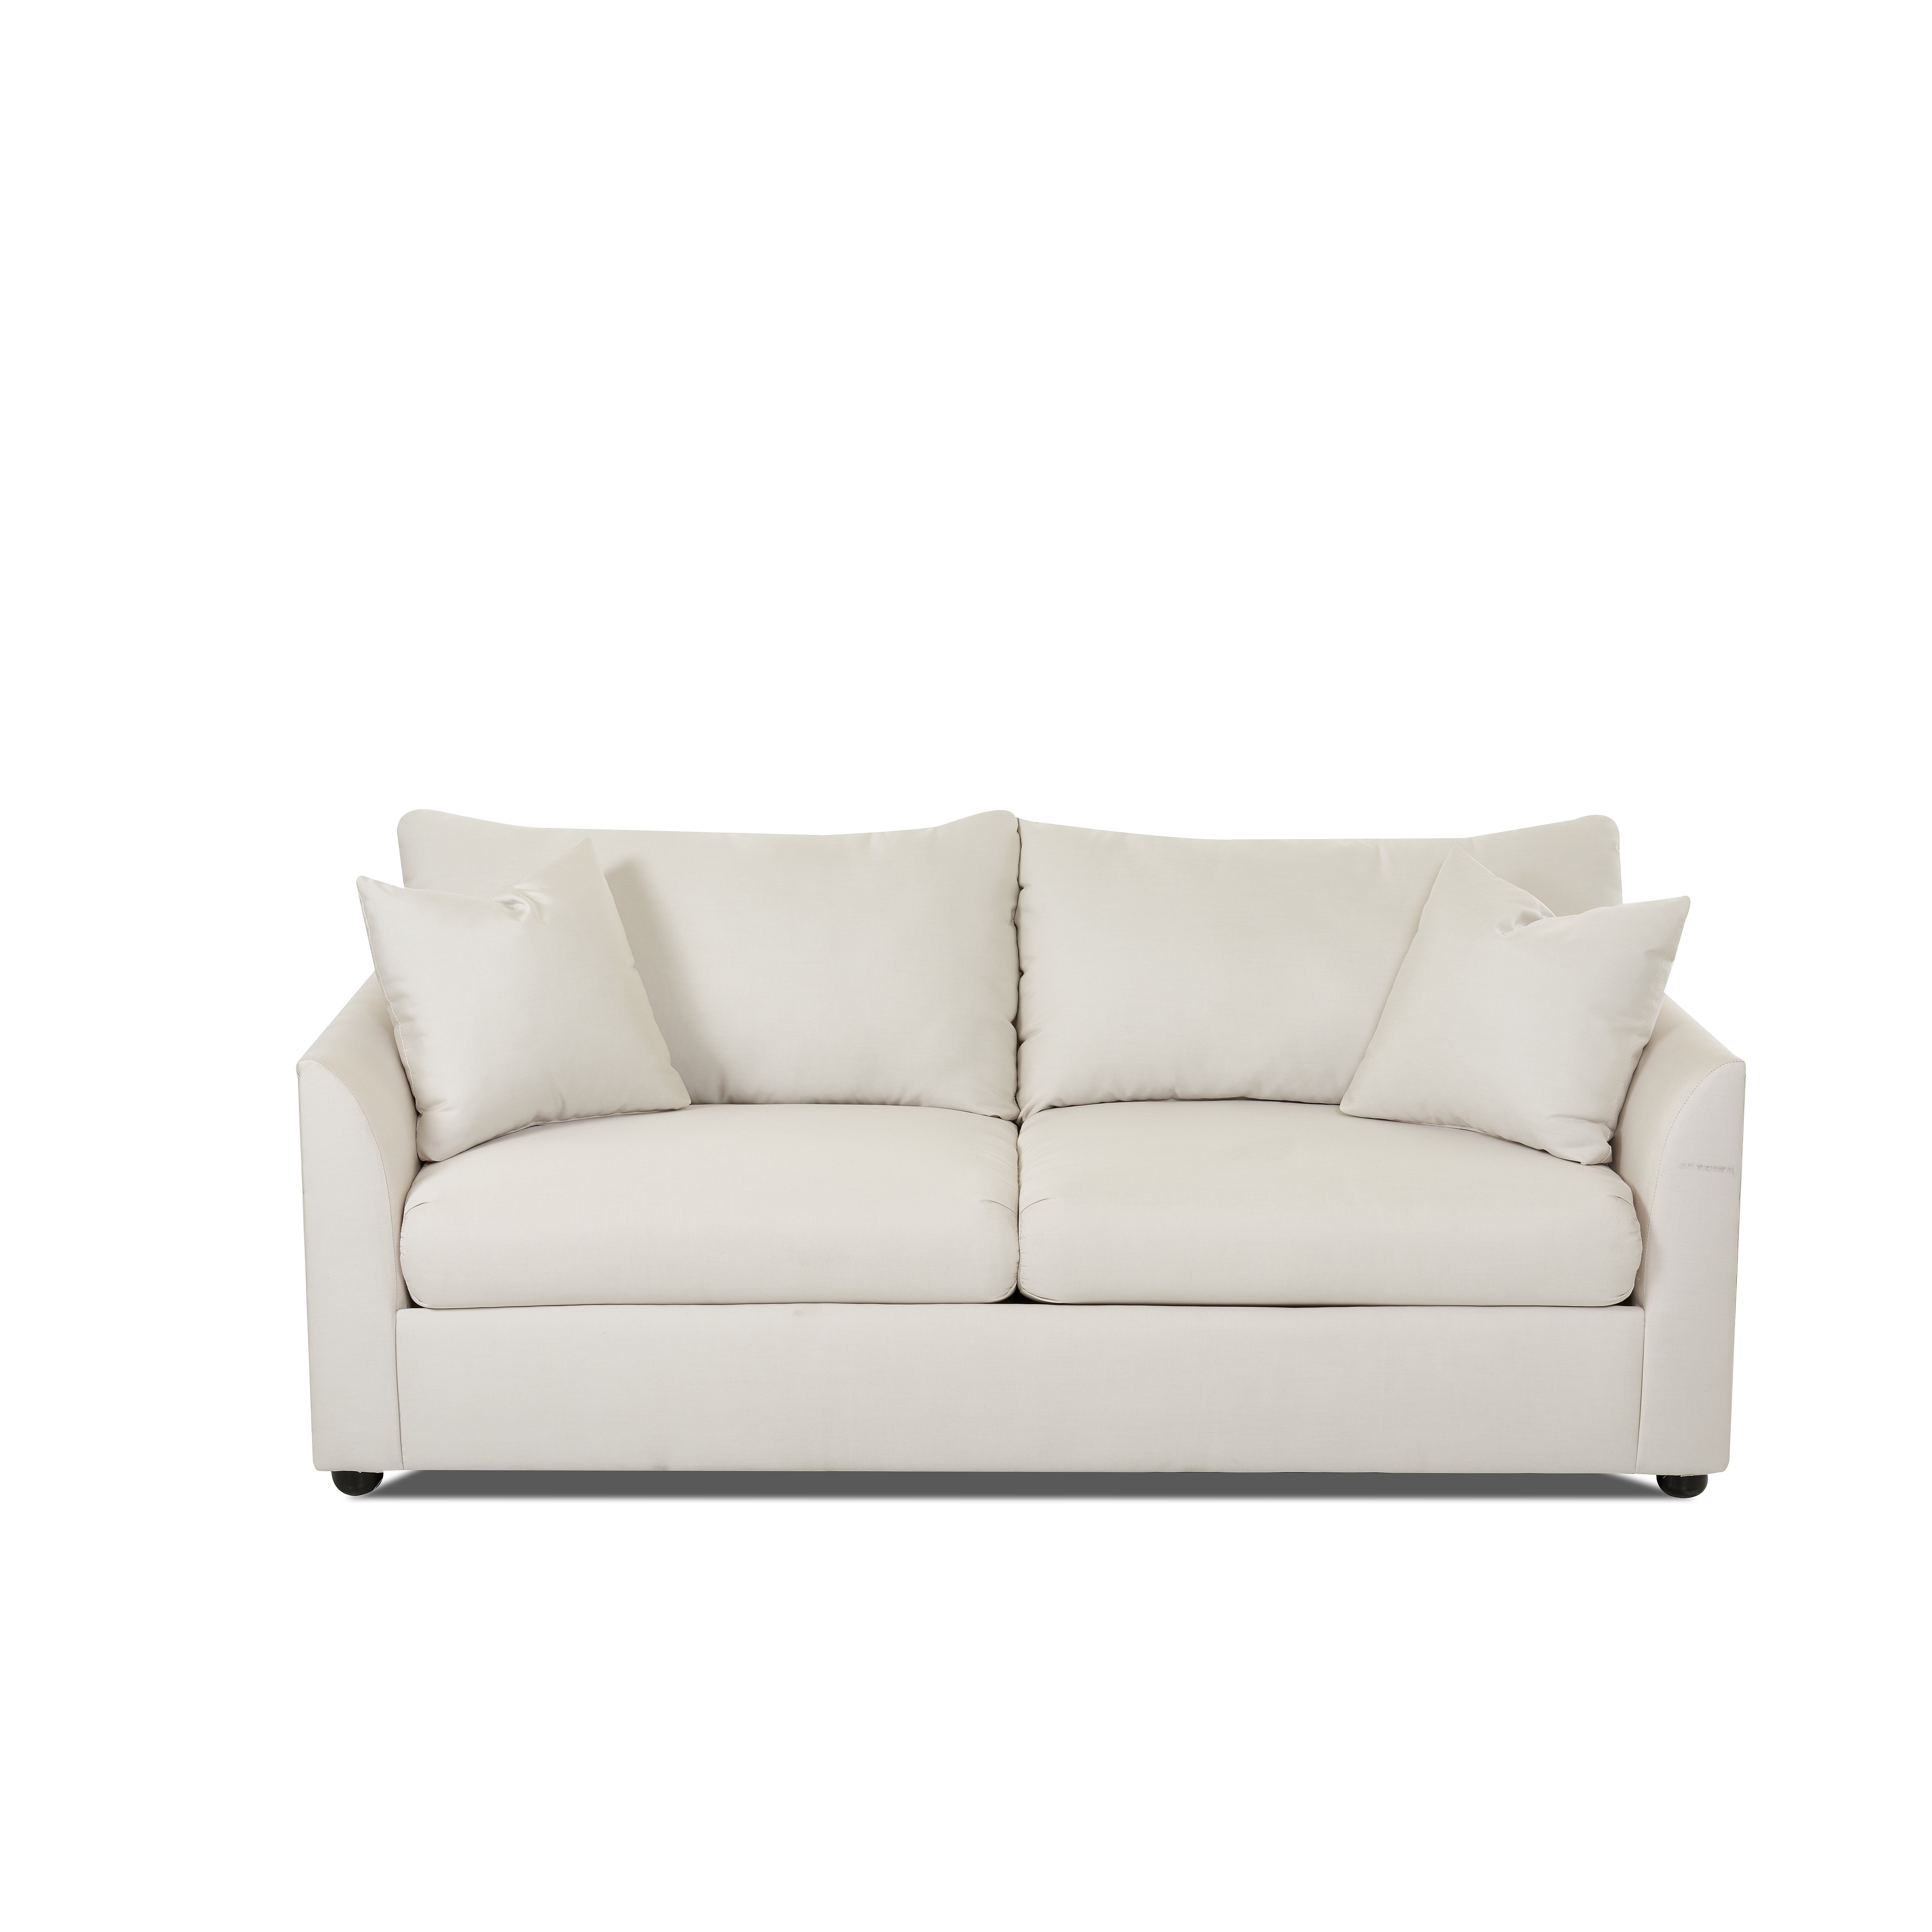 Klaussner furniture kaylee sofa for Klaussner sofa